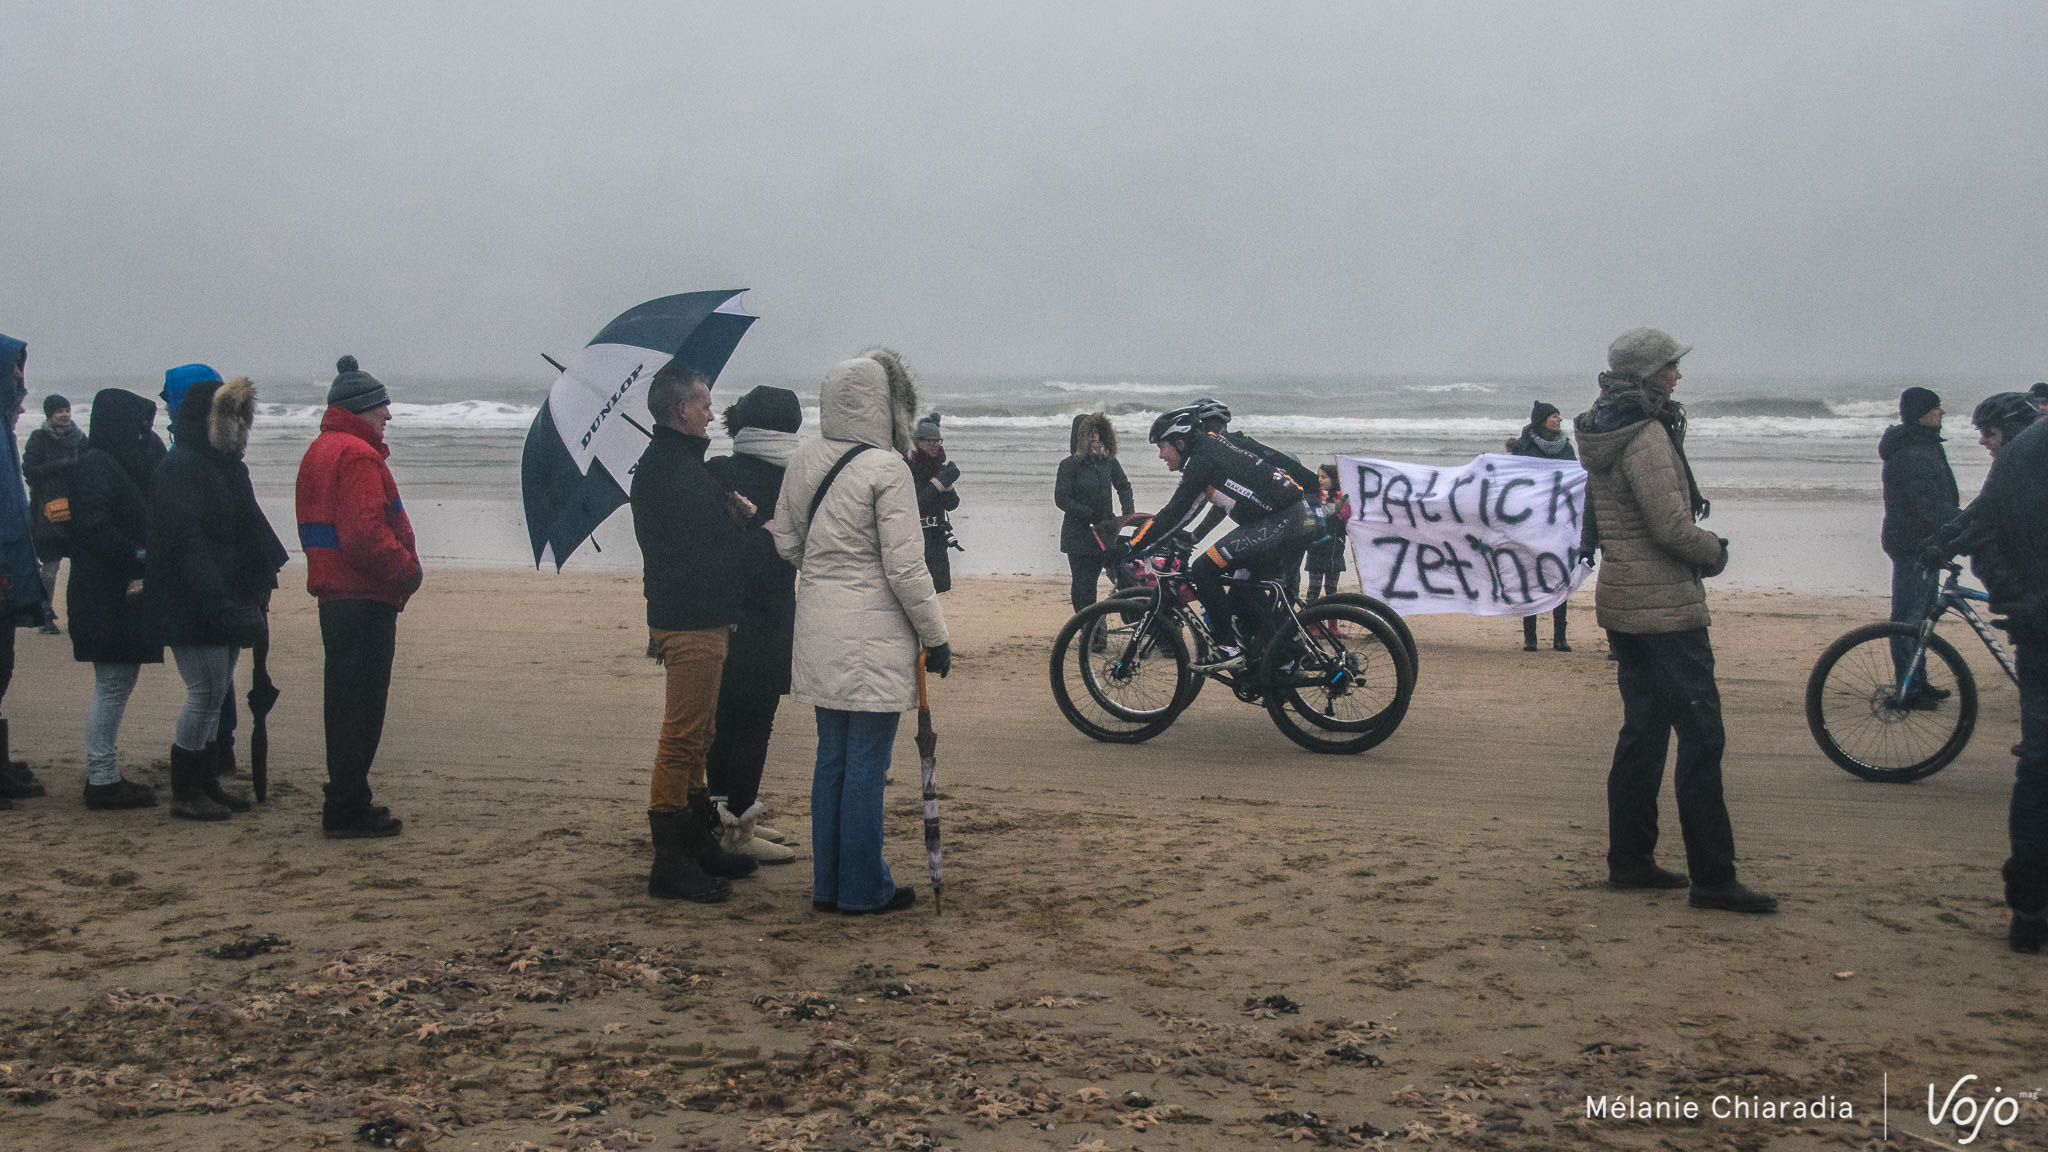 beachrace_egmond_pier_egmond_mel_copyright_obeart_vojomag-29